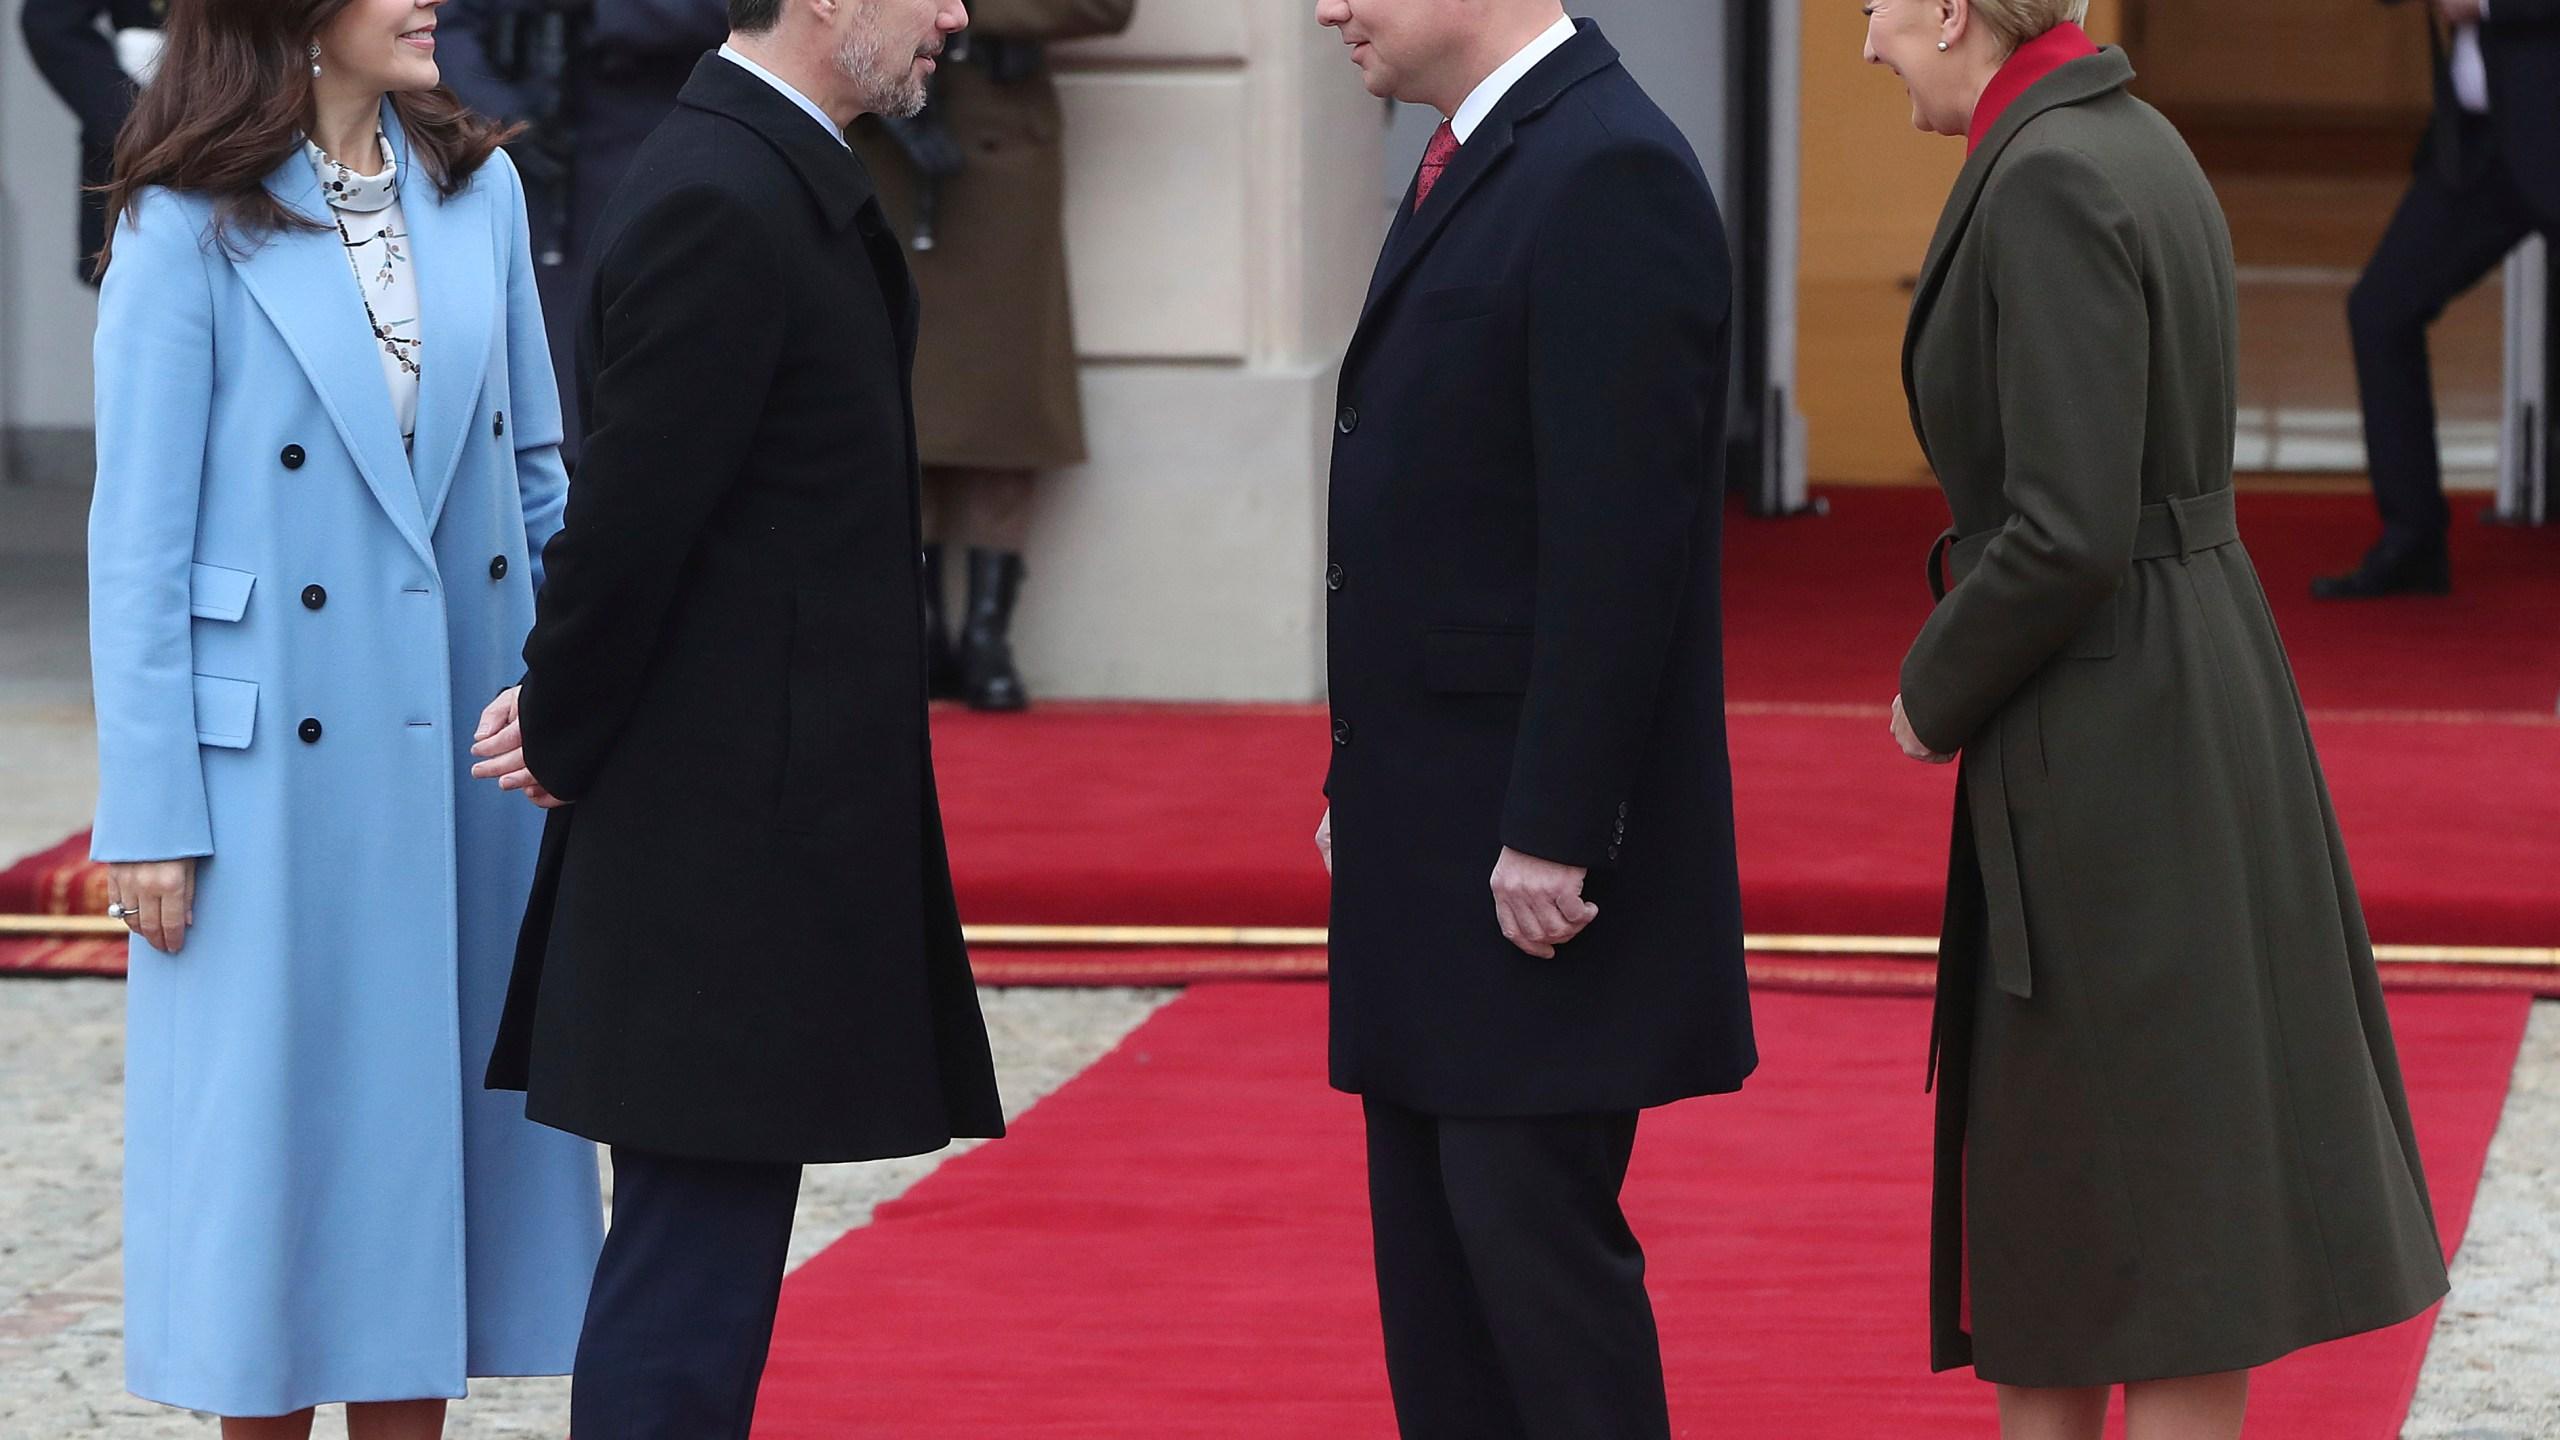 Prince Frederik, Princess Mary, Andrzej Duda, Agata Kornhauser-Duda